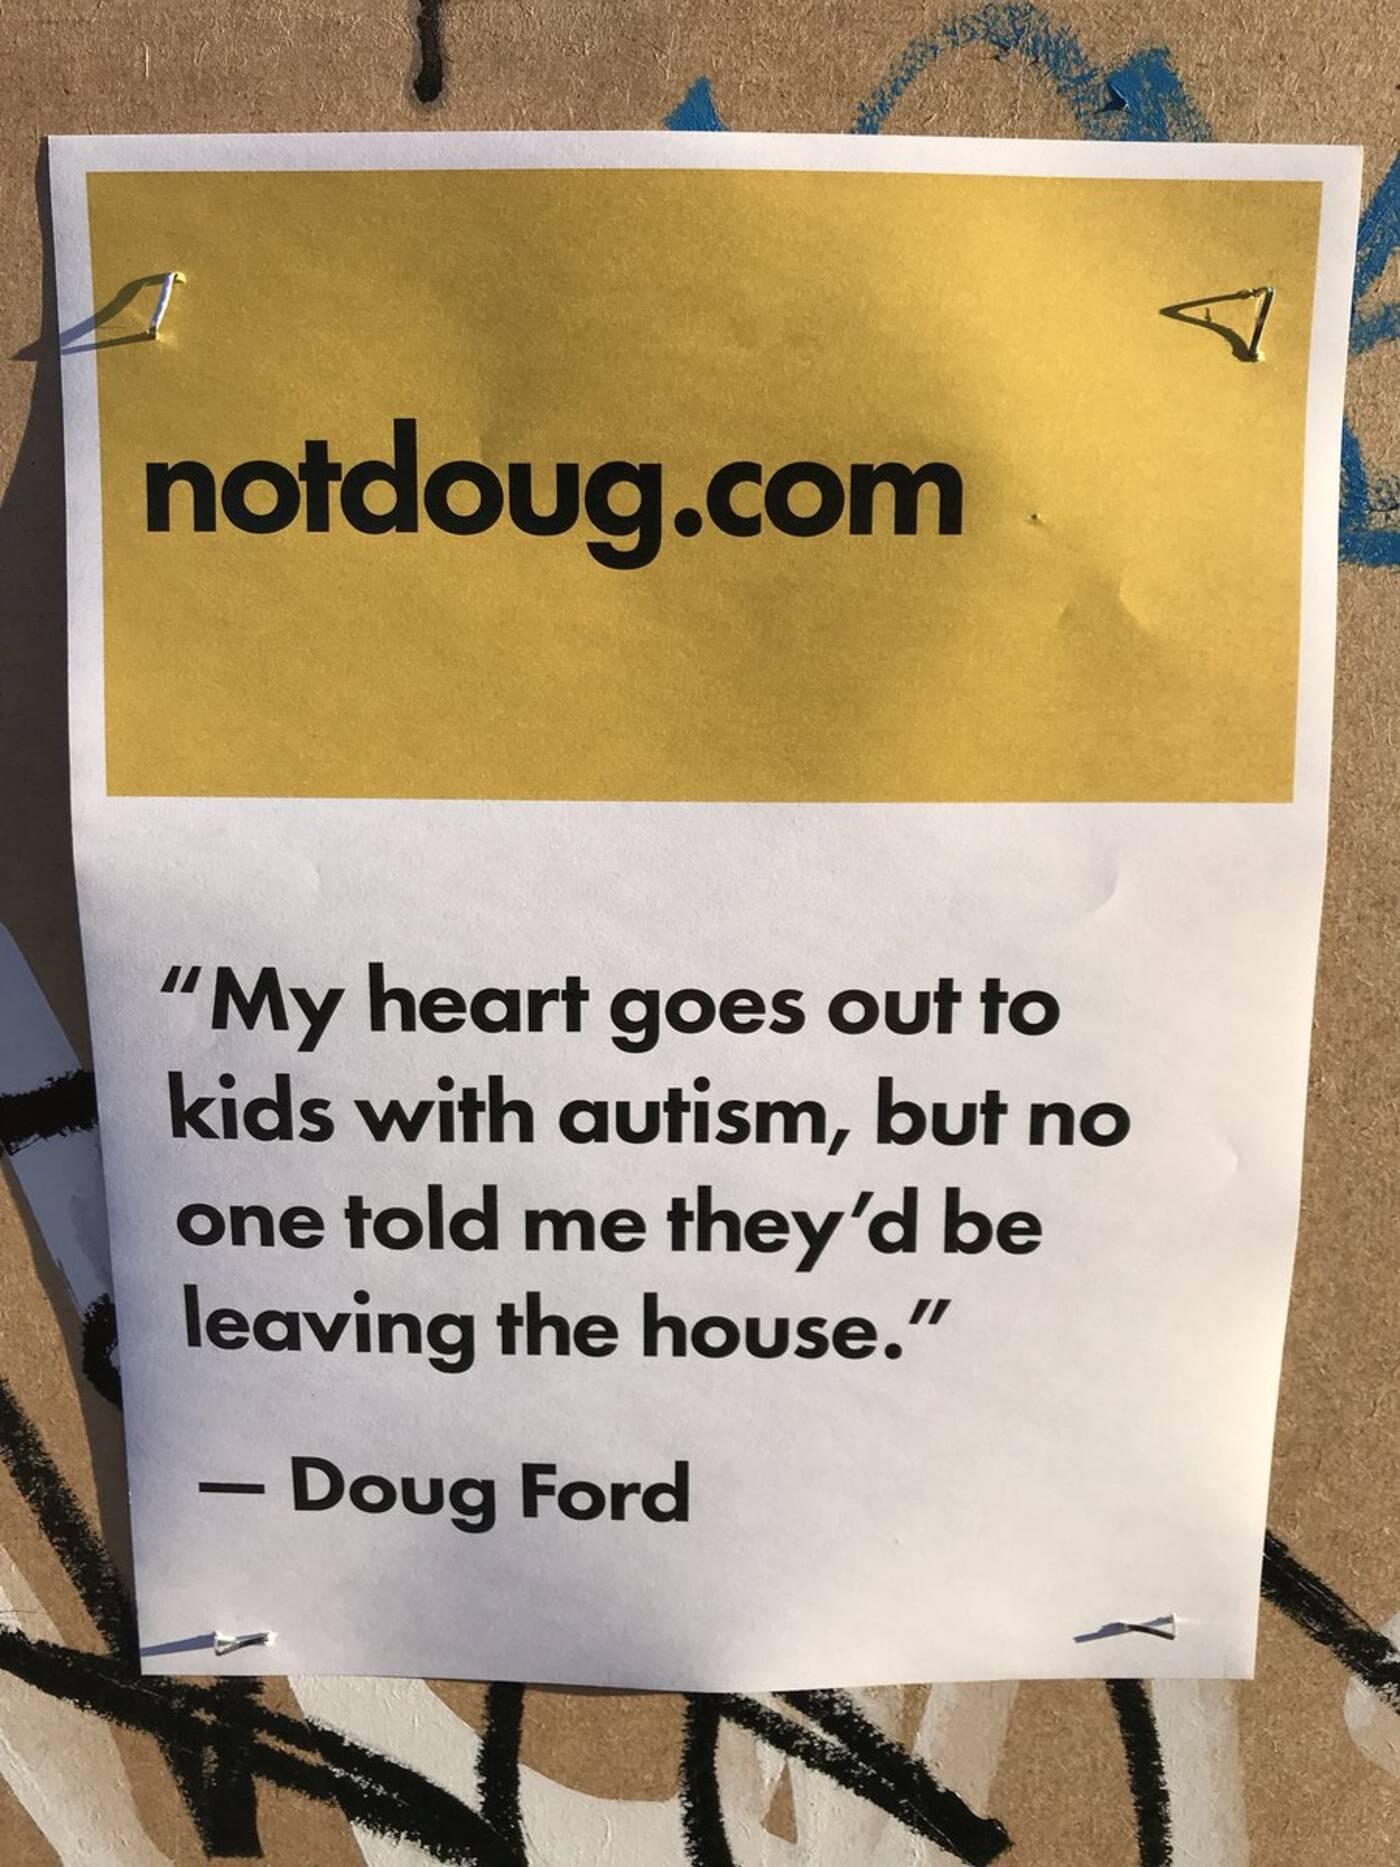 NotDoug campaign